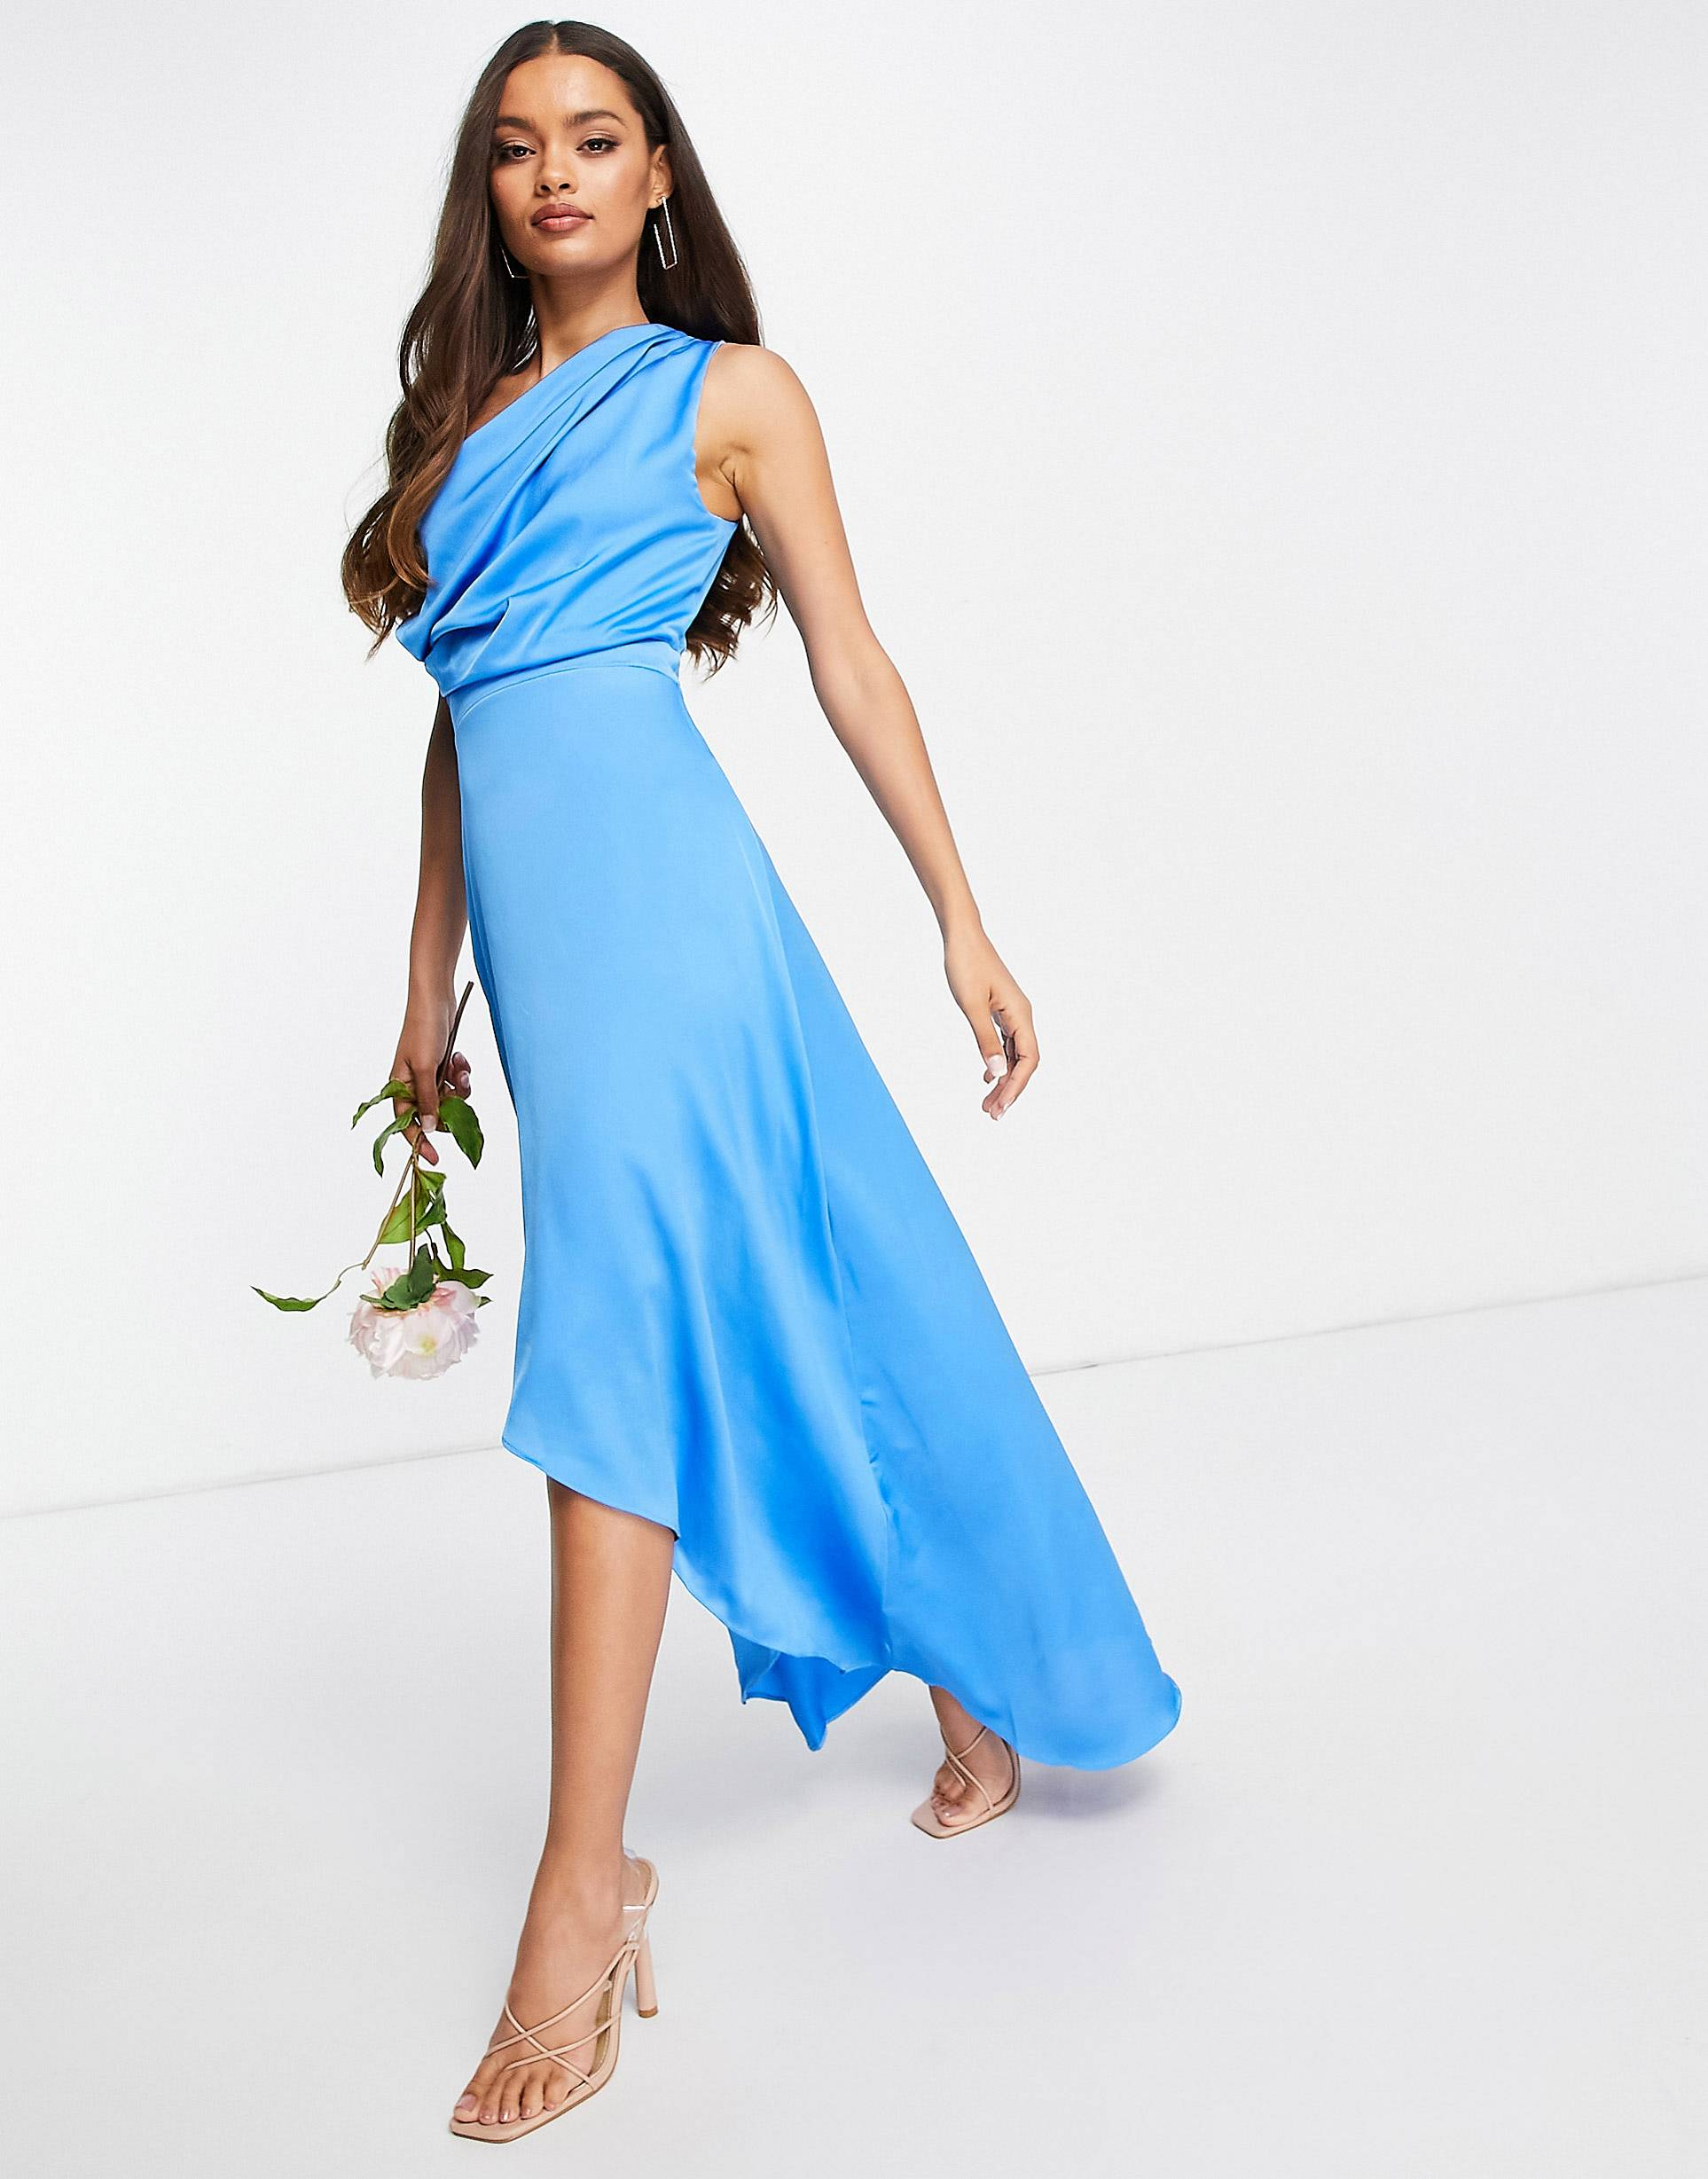 Vestido largo azul cobalto asimétrico.